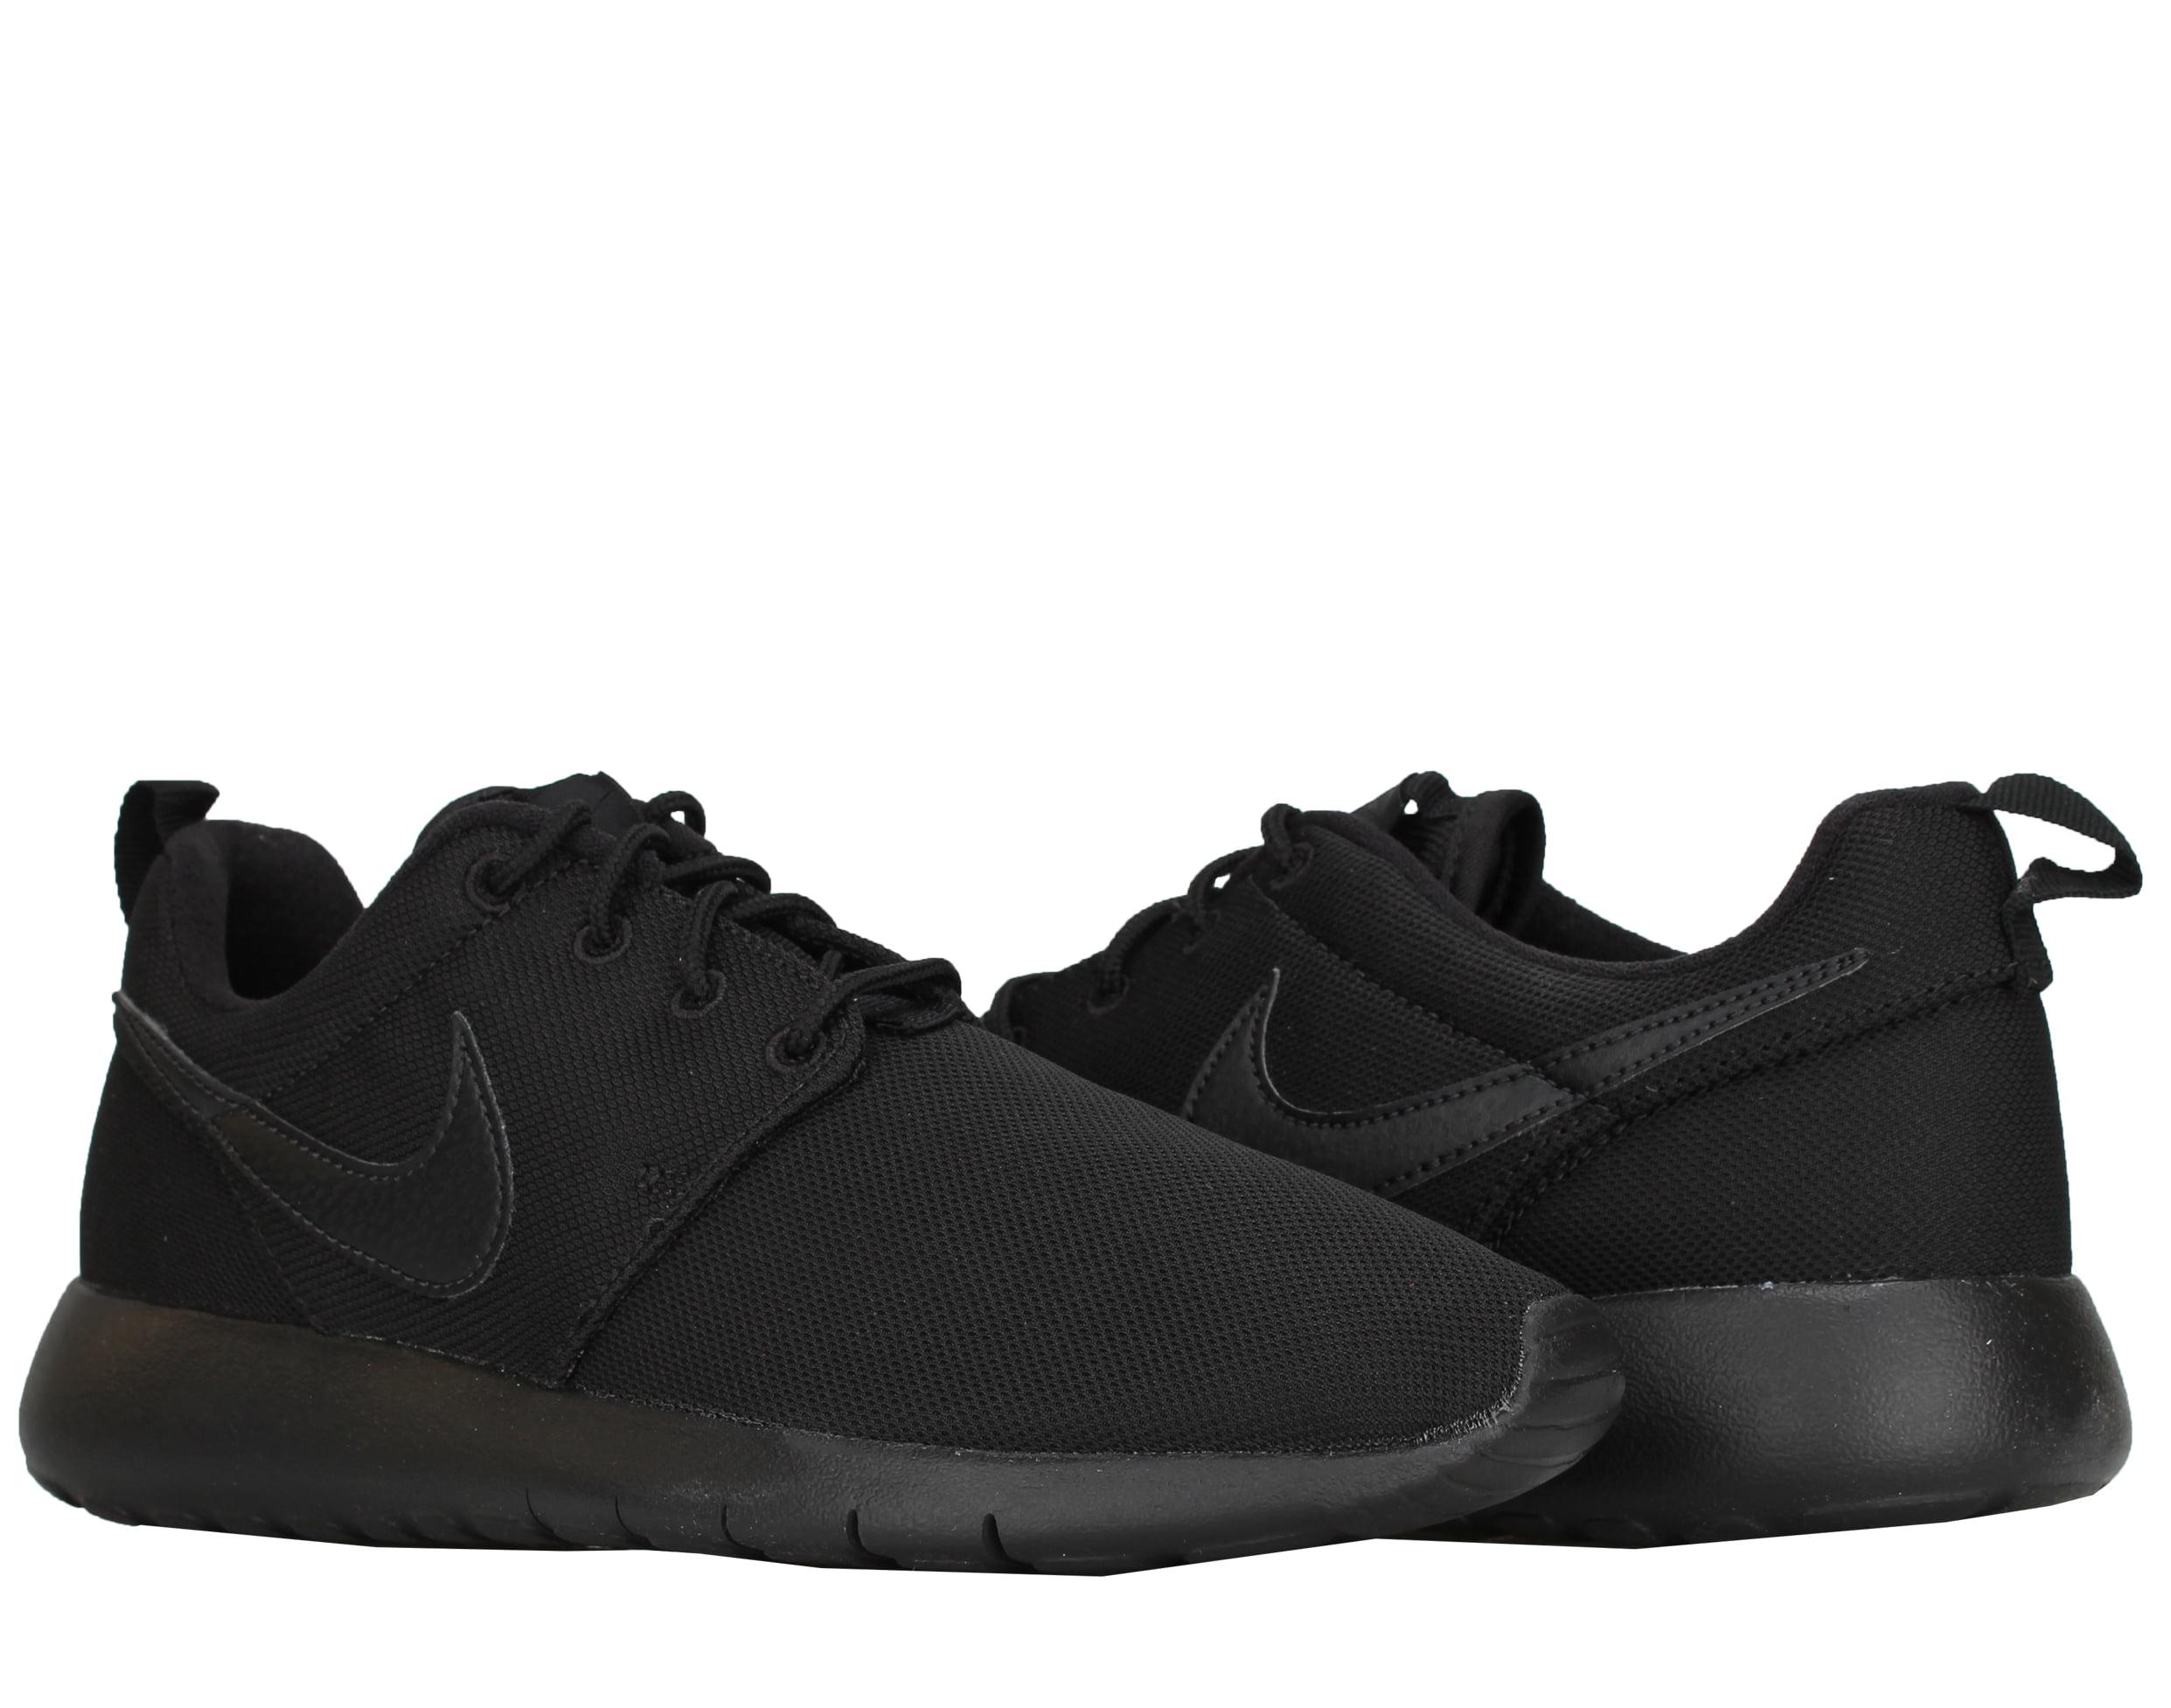 488c3c221378 ... promo code for nike nike roshe one gs black black big kids running shoes  599728 031